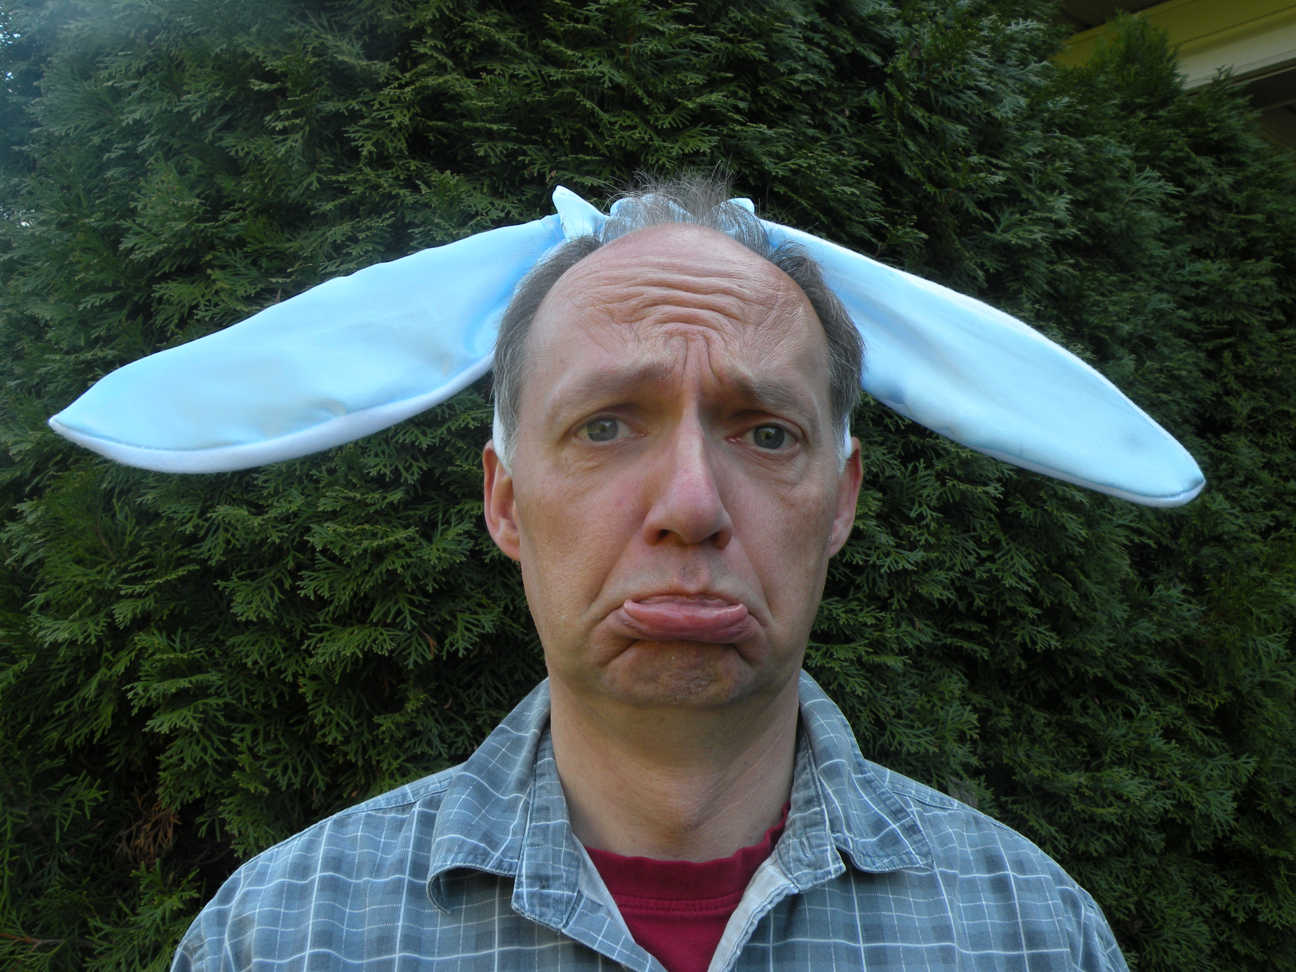 sad bunny brand persona image